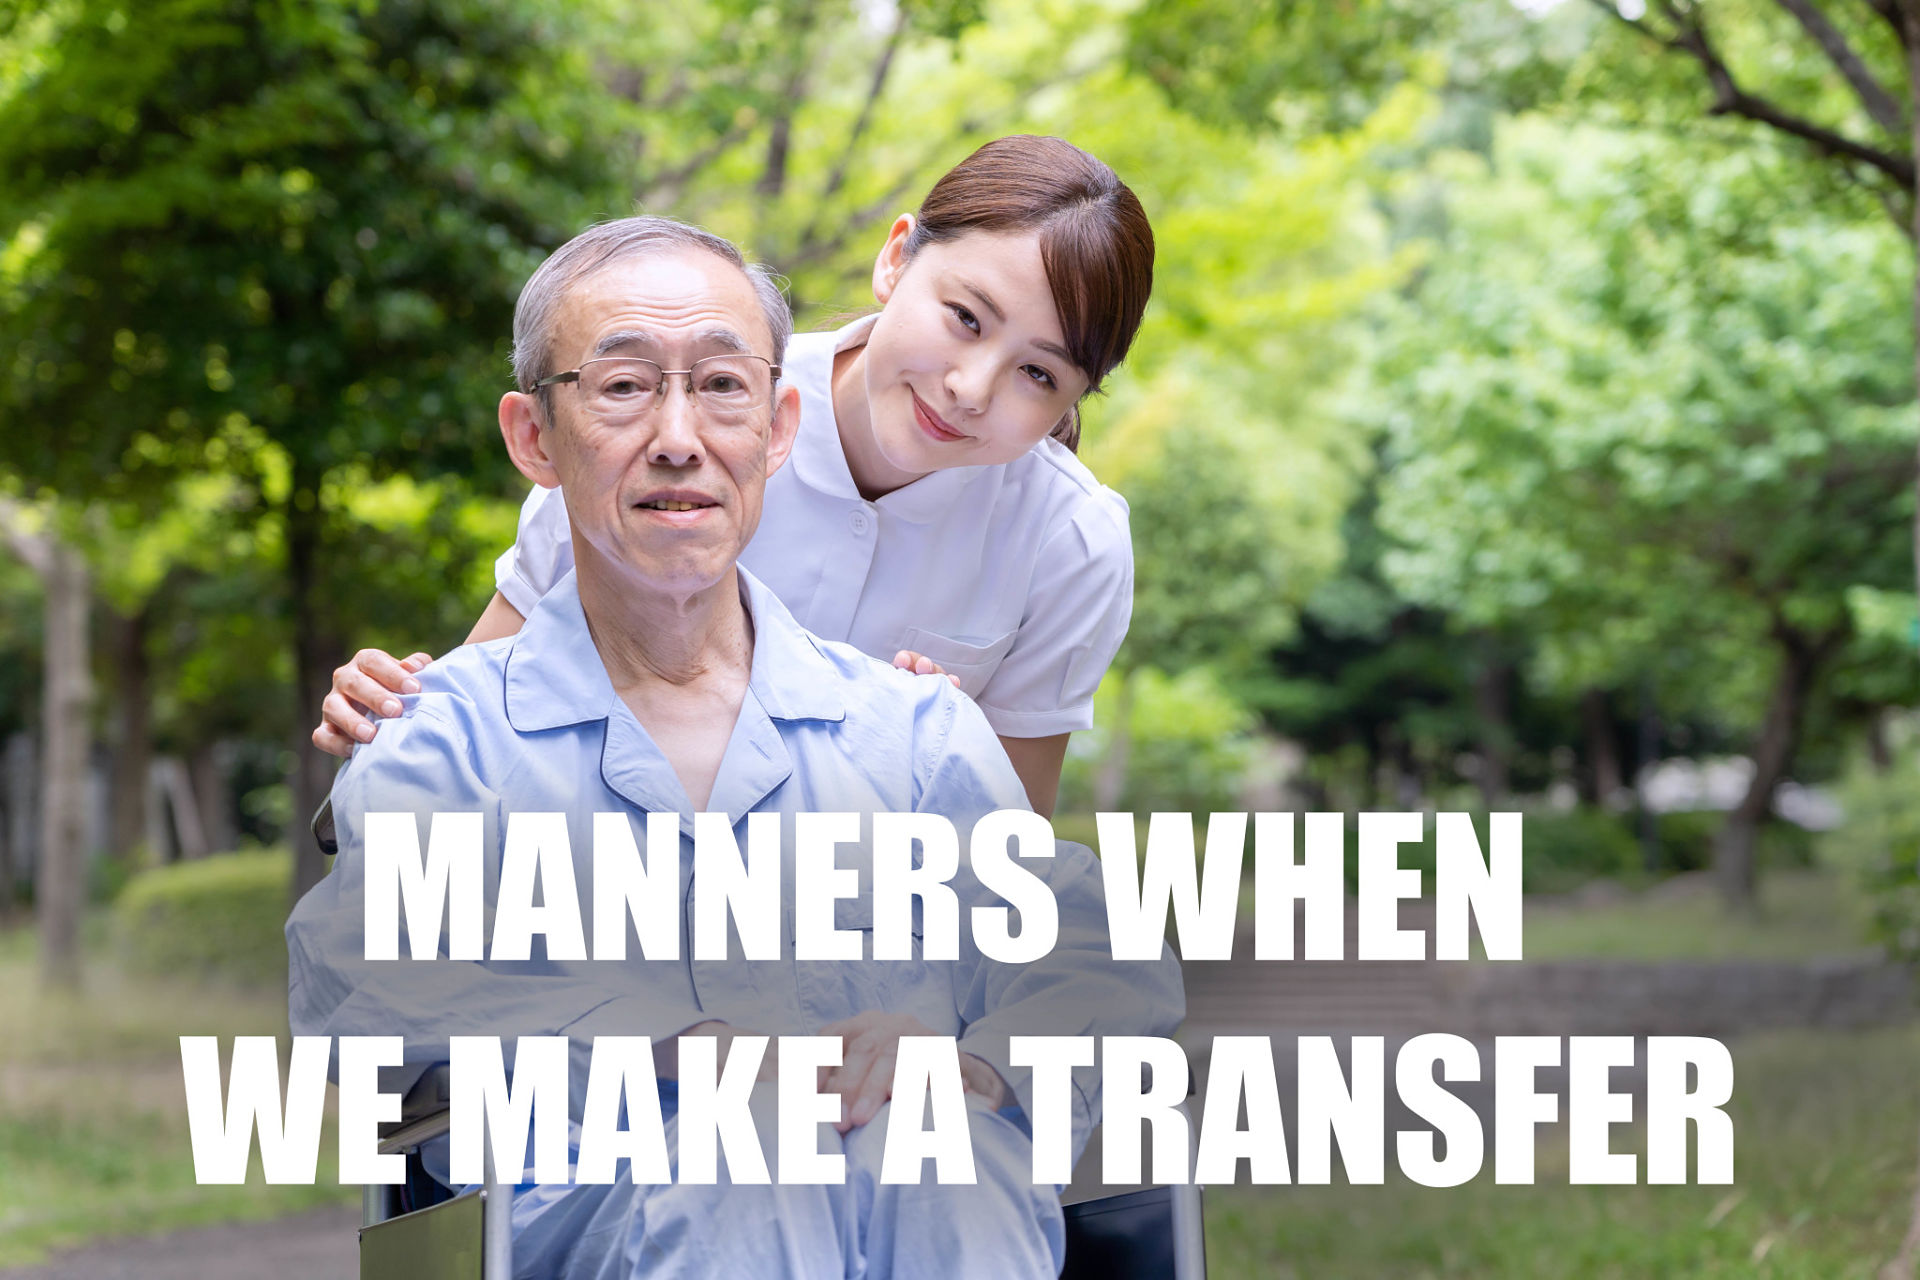 MODALES CUANDO HACEMOS  UNA TRANSFERENCIA/移送を行うときのマナー